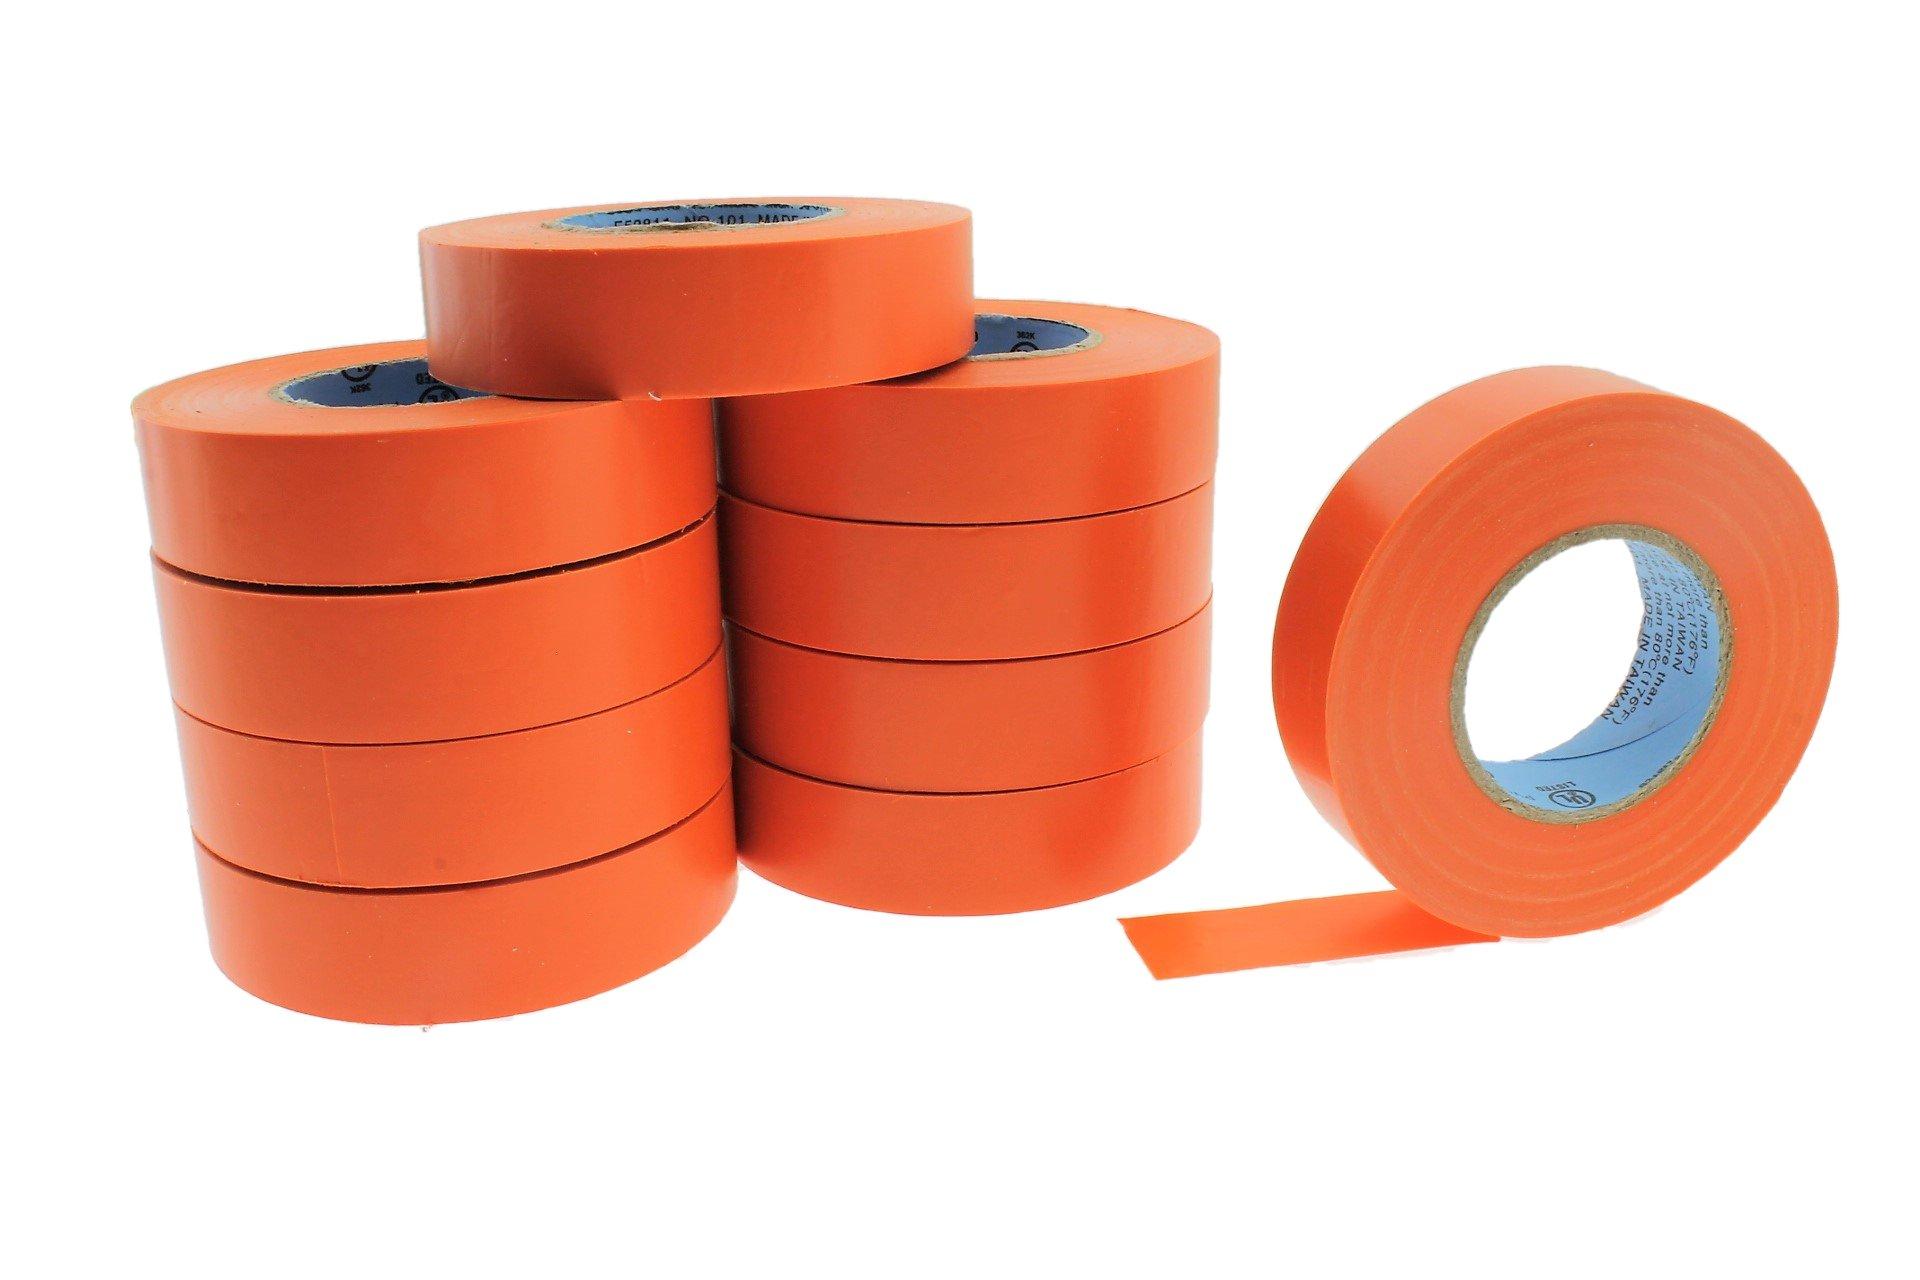 10pk 3/4'' ORANGE Electrical Tape Supreme Durable .75 Pro-Grade Wire harness PVC Vinyl Marking Labeling Coding Warning Safety Flame Retardant 60' 7 mil